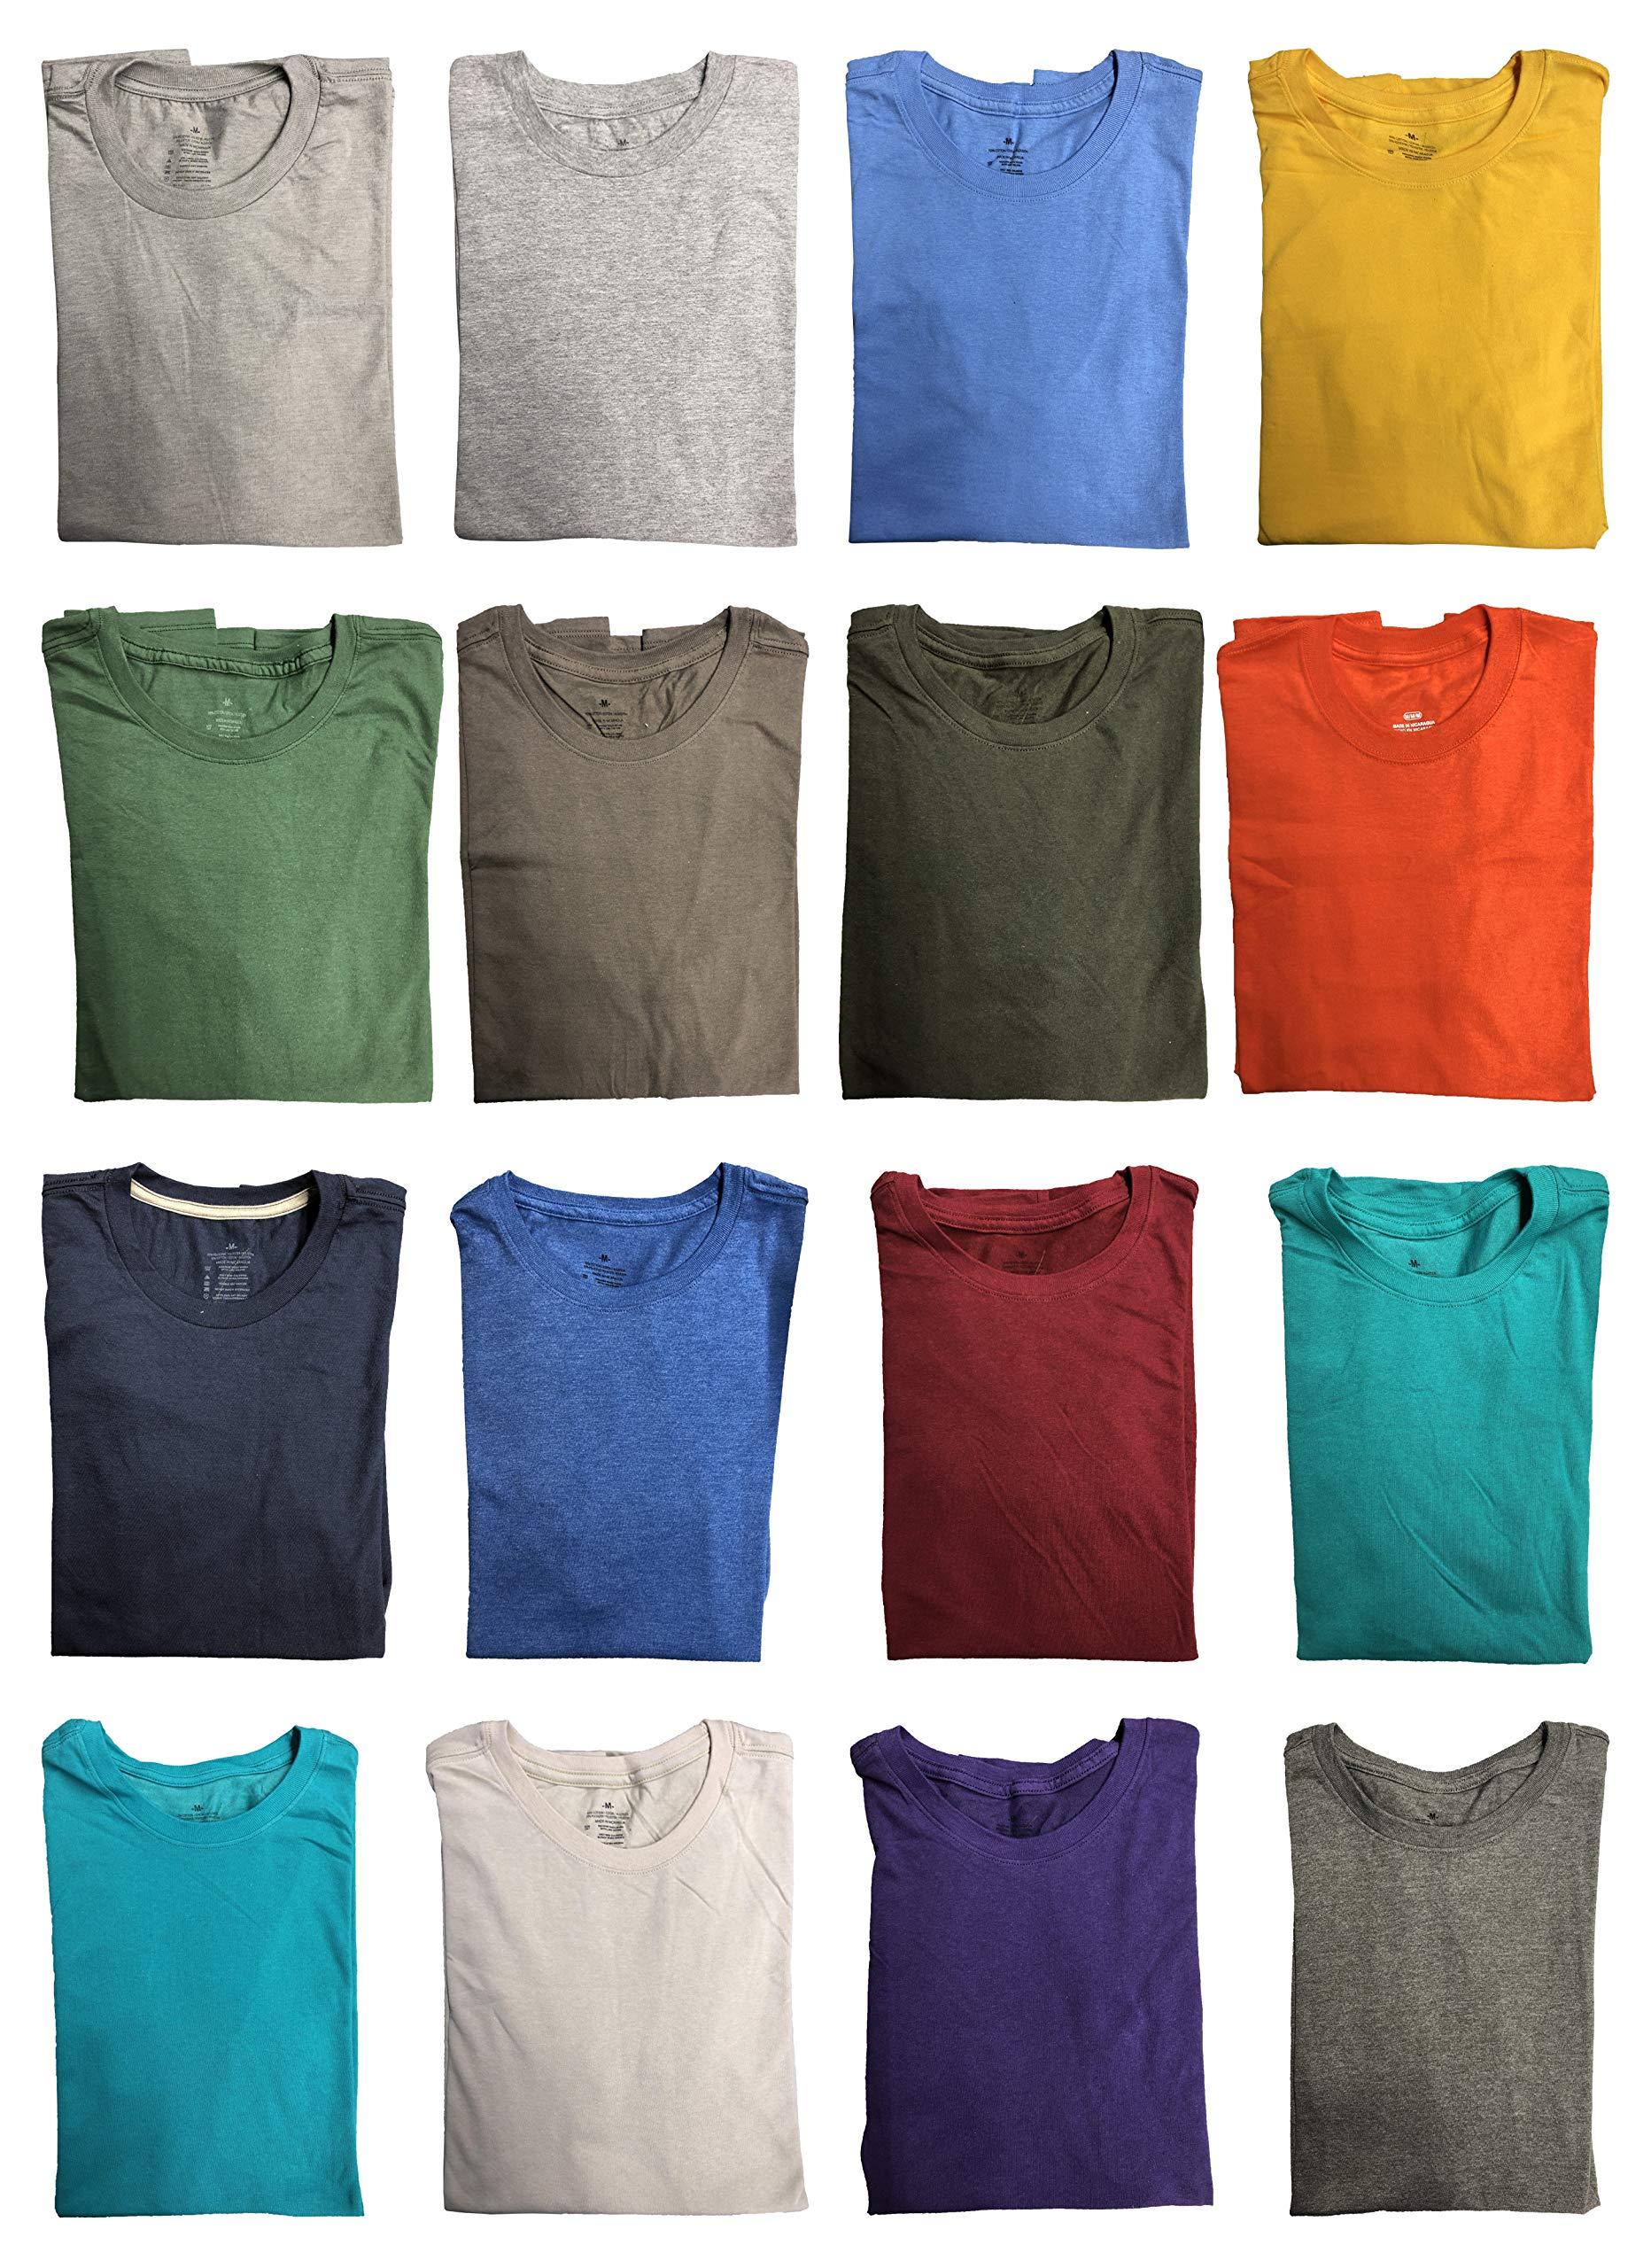 SOCKS'NBULK Mens Cotton Crew Neck Short Sleeve T-Shirts Mix Colors Bulk Pack Value Deal (180 Pack Mix, Large) by SOCKS'NBULK (Image #1)